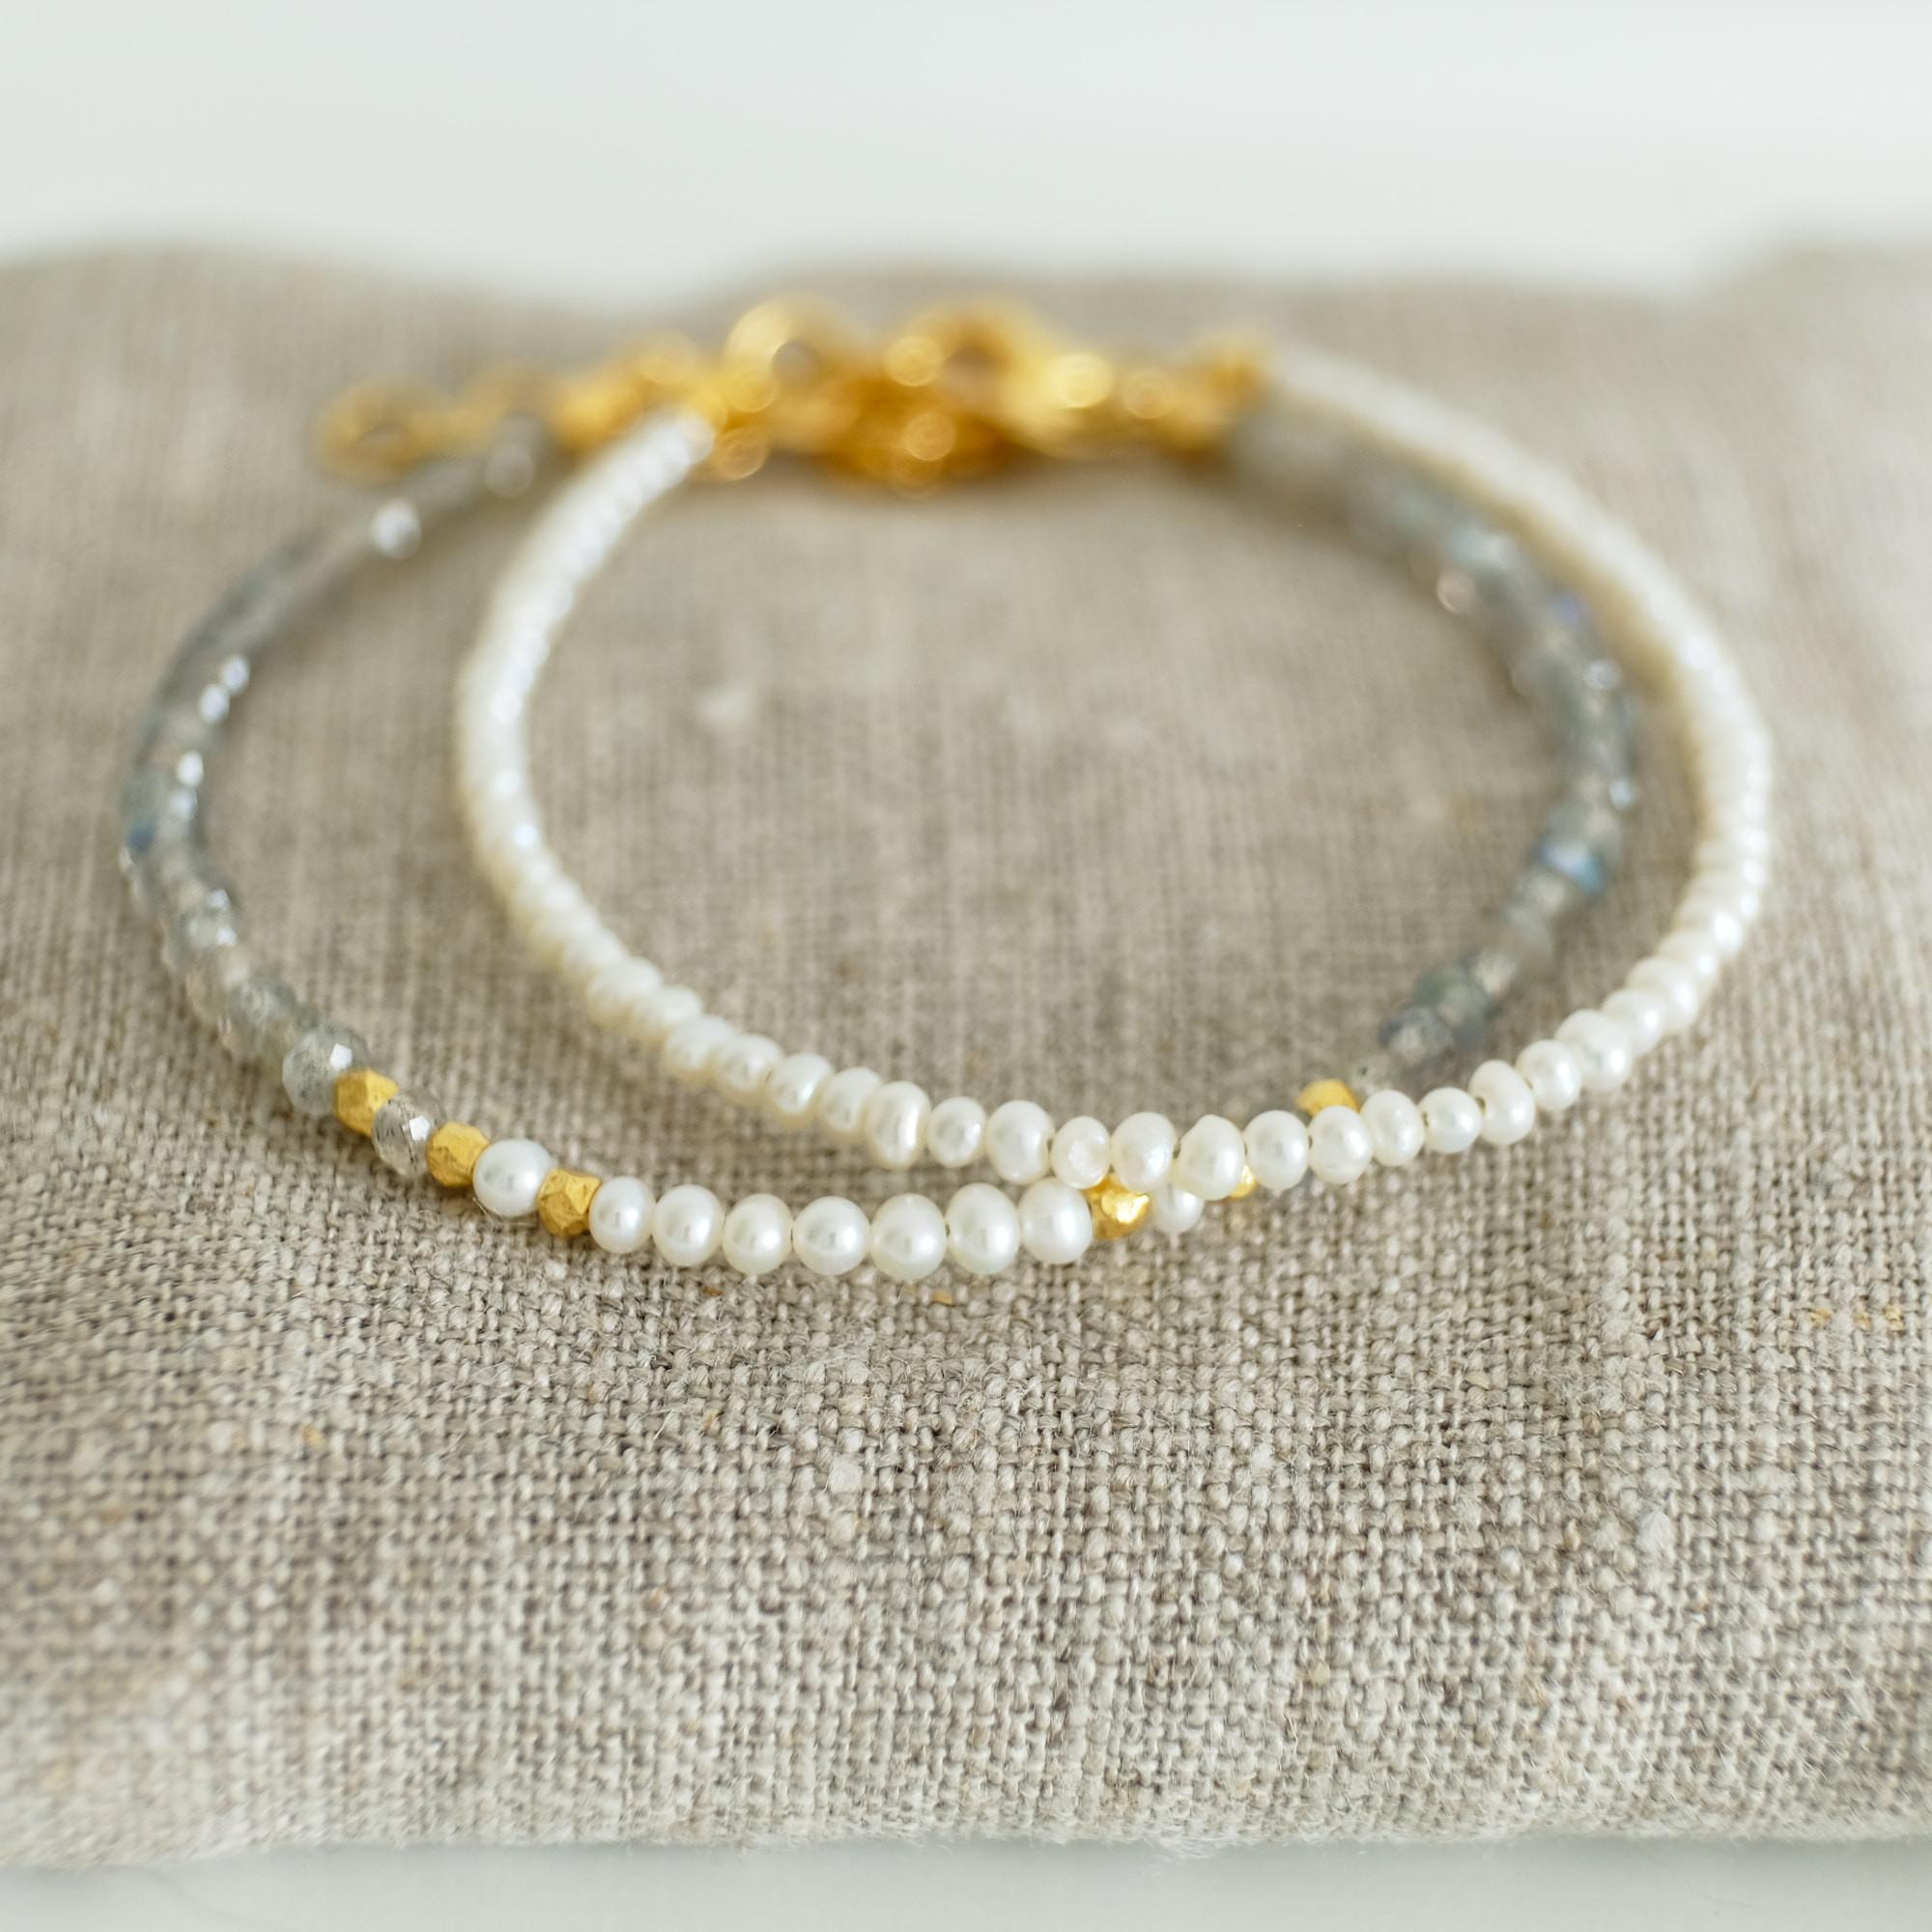 Armbånd med små hvide perler 3 mm, sølv el. forgyldt sølv